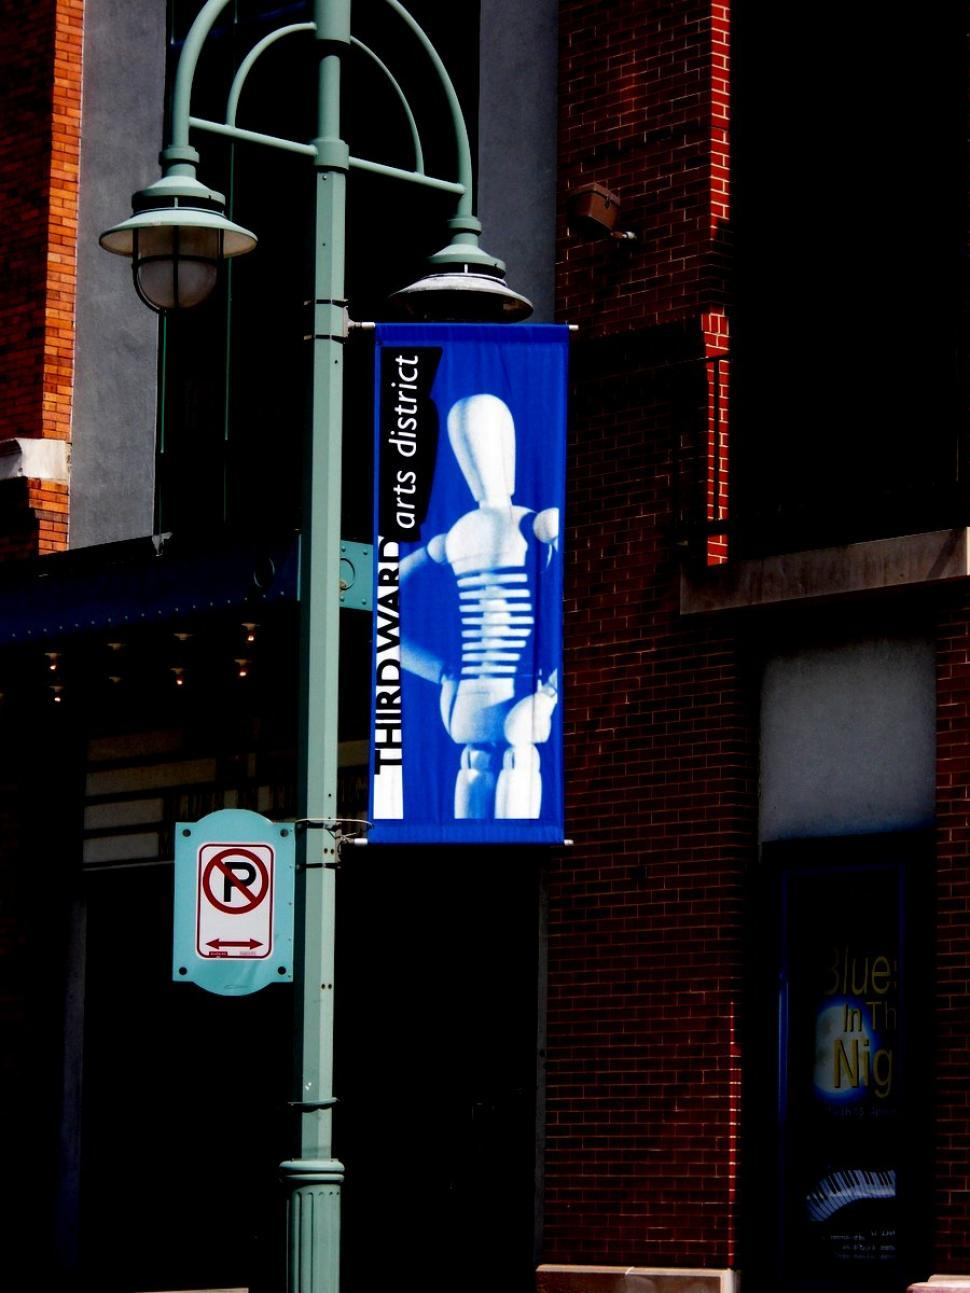 Download Free Stock HD Photo of Milwaukee - Third Ward Banner Online